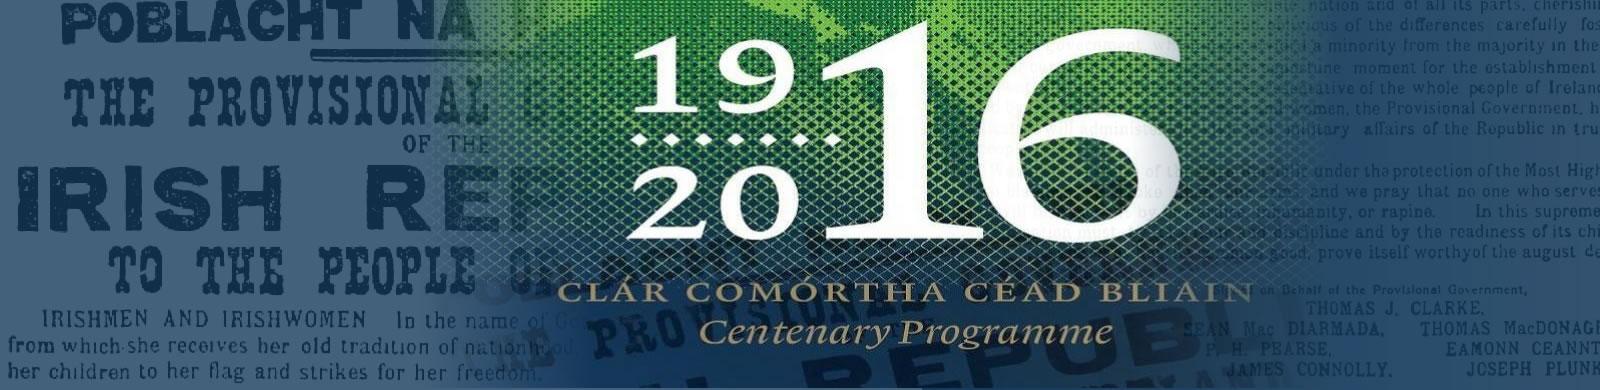 1916 Centenary Programme